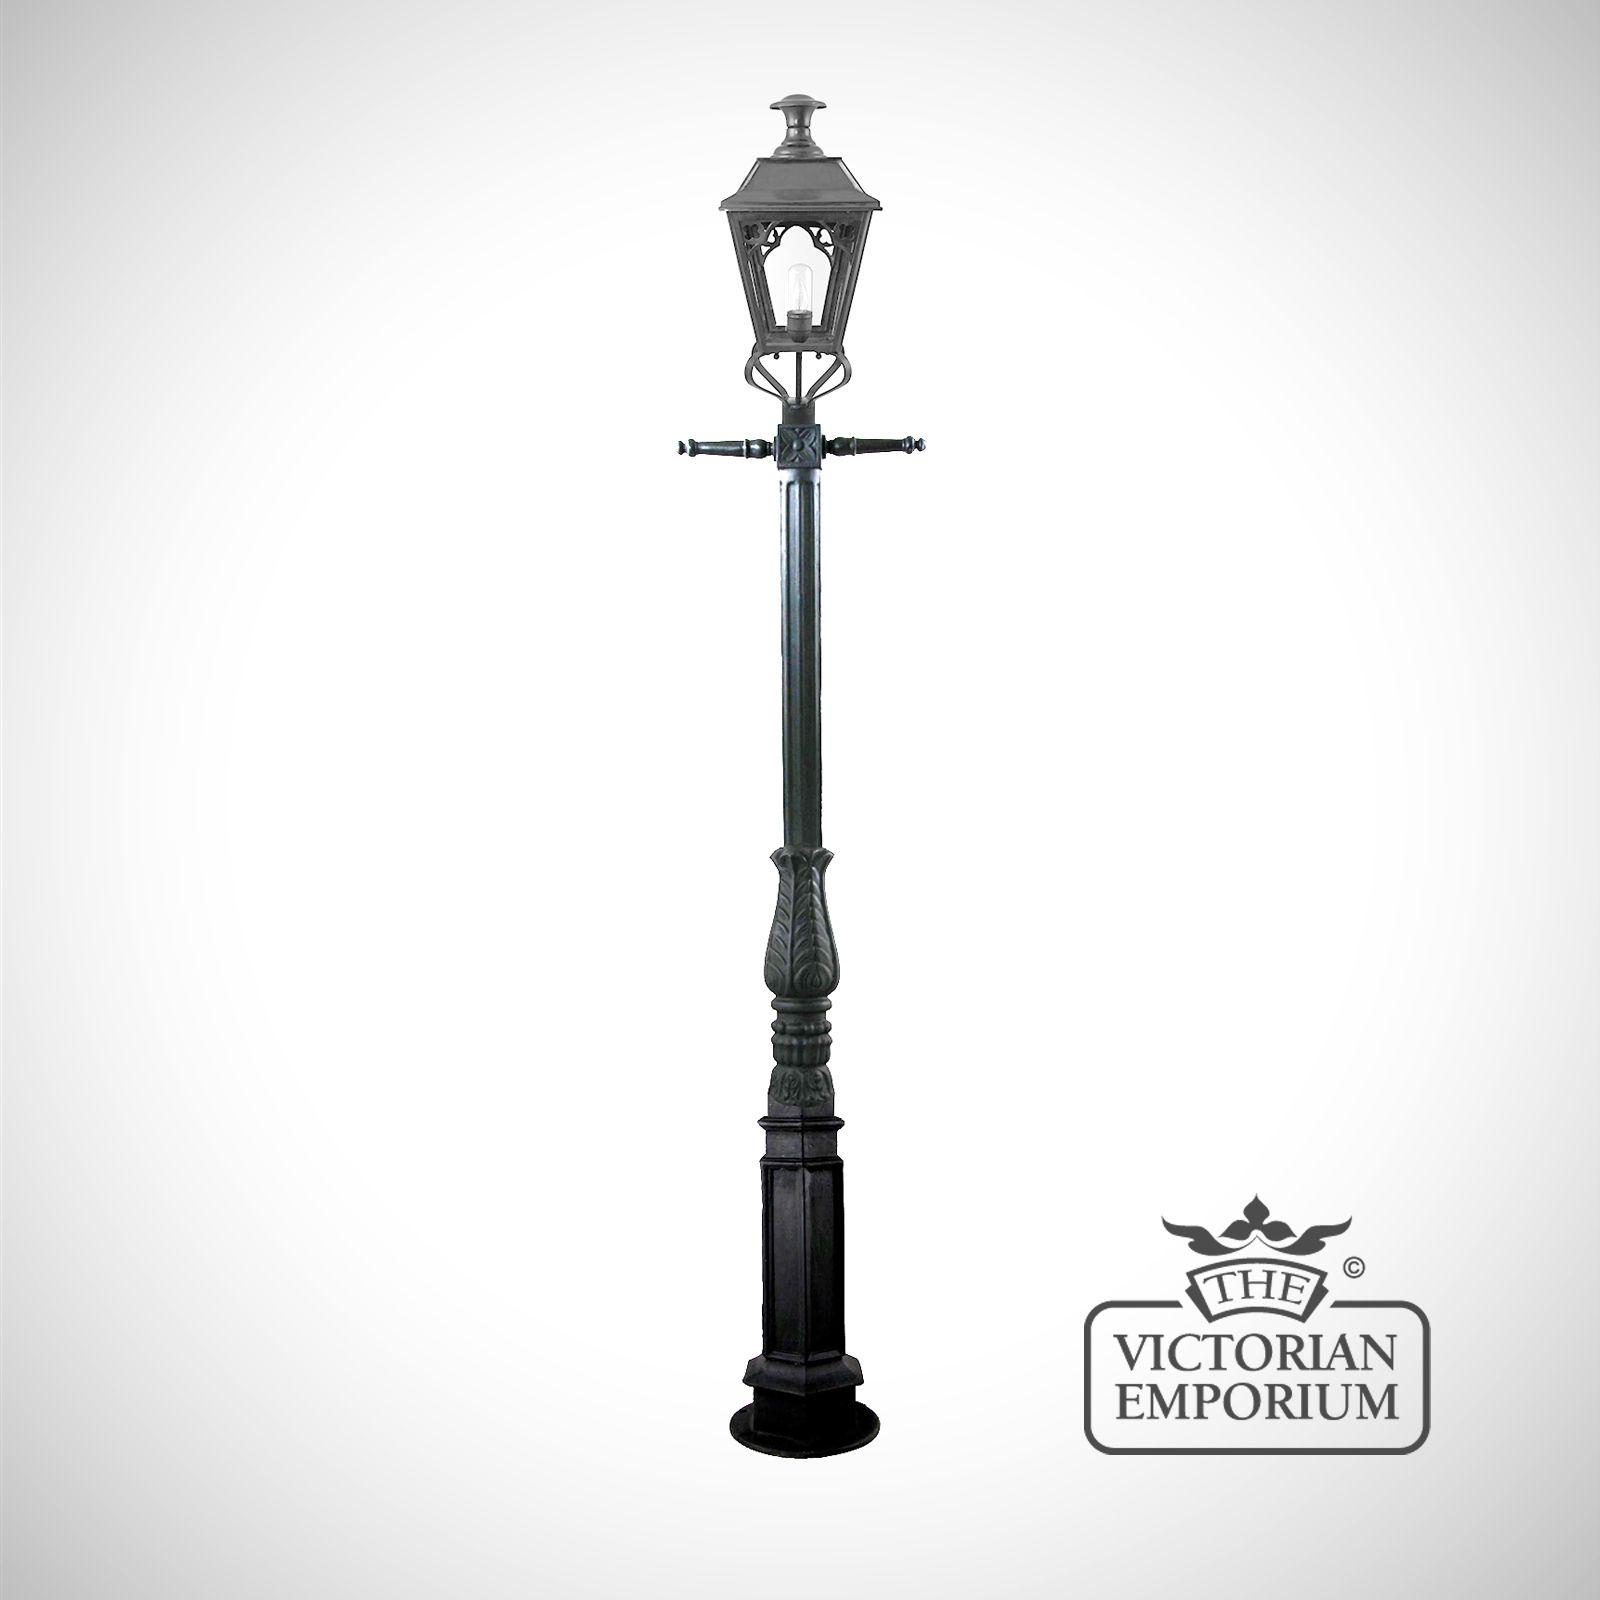 Simplistic Victorian Entrance Pillar Light: William Cast Iron Lamp Post With Medium Lantern In Black